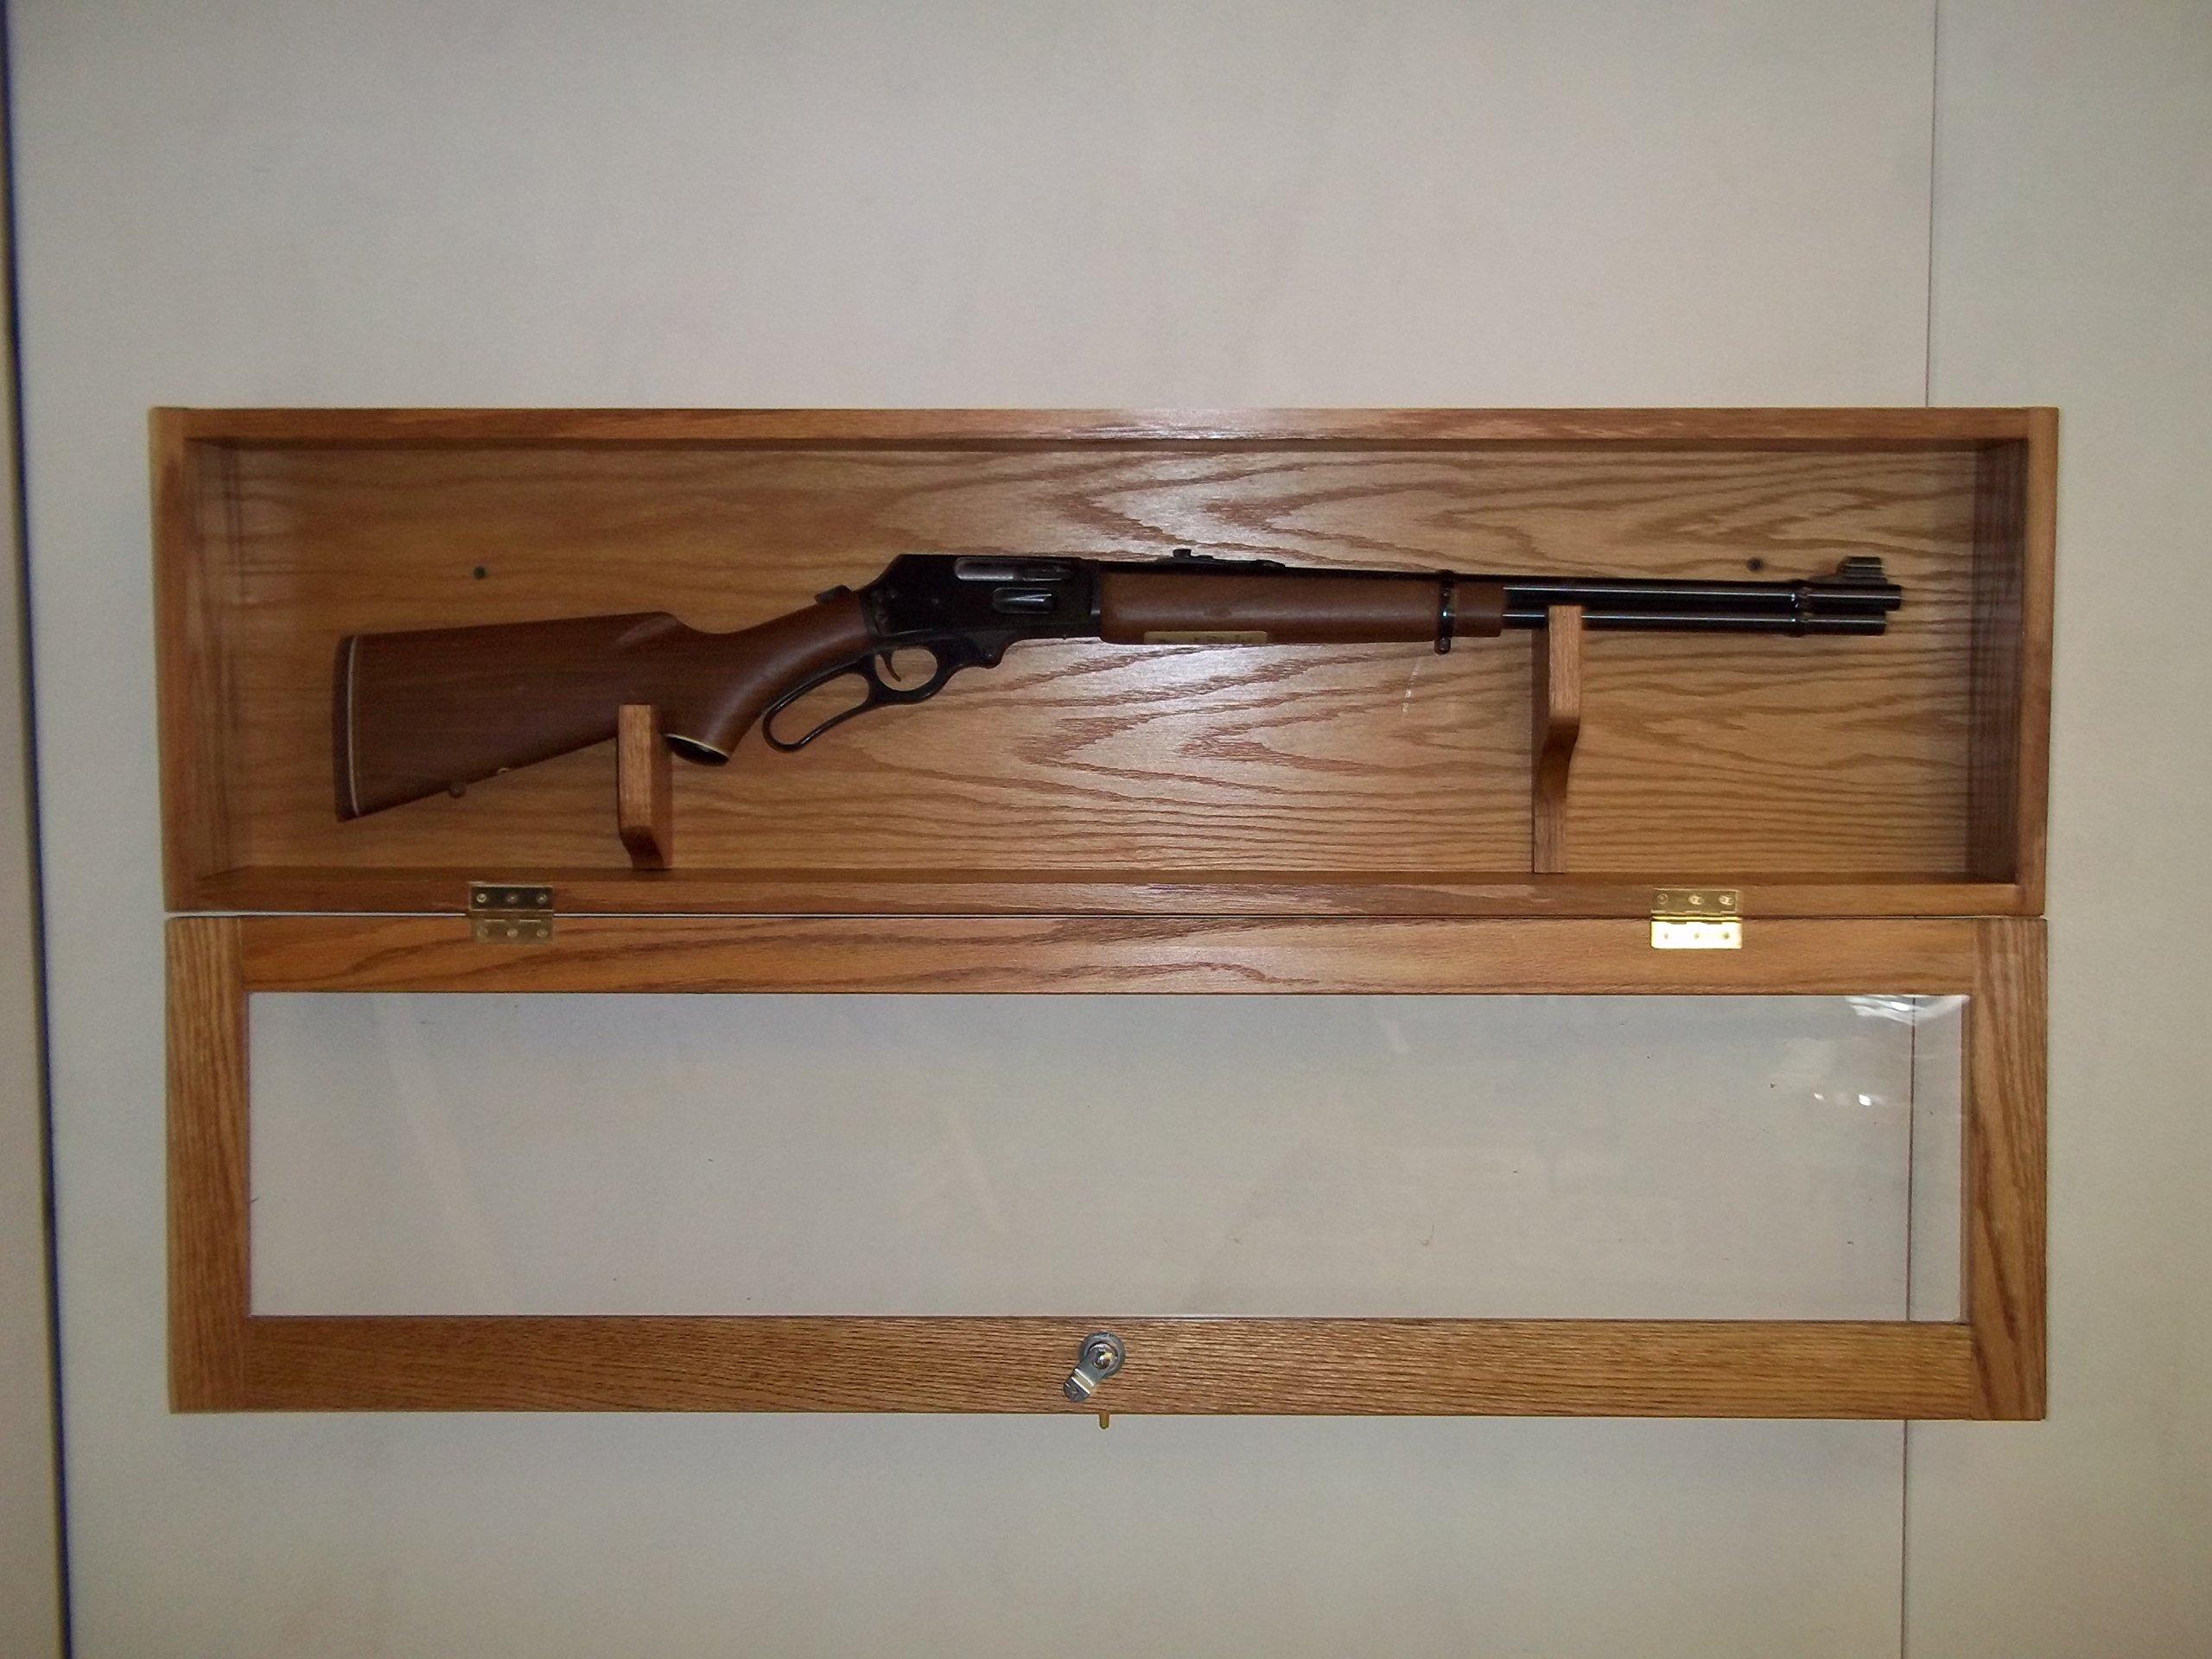 Locking Gun Display Case for 30-30 by oakwoodgunracks.com (Image #1)